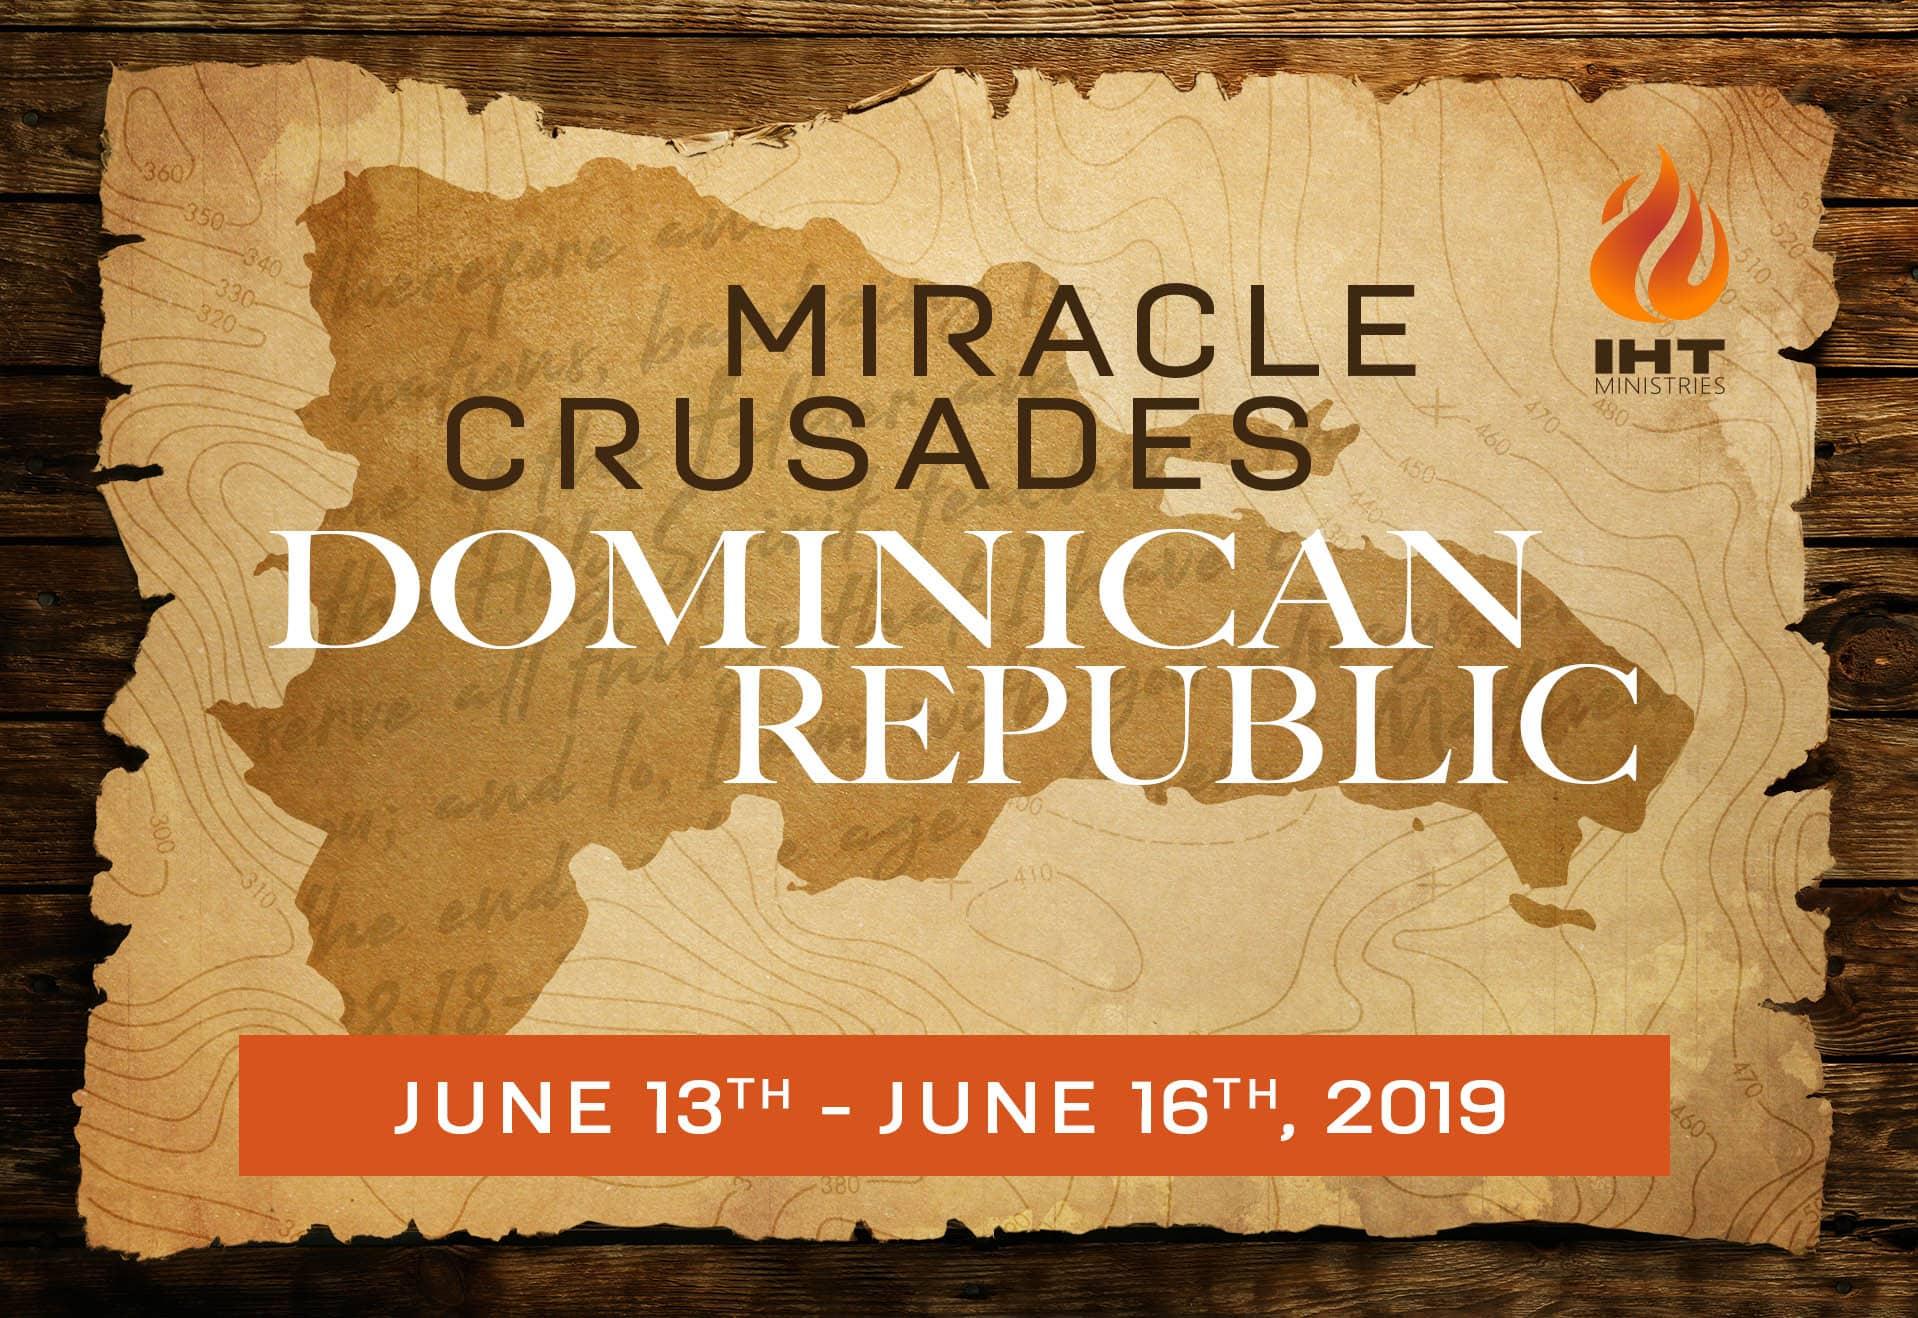 Dominican Republic Crusades 2019